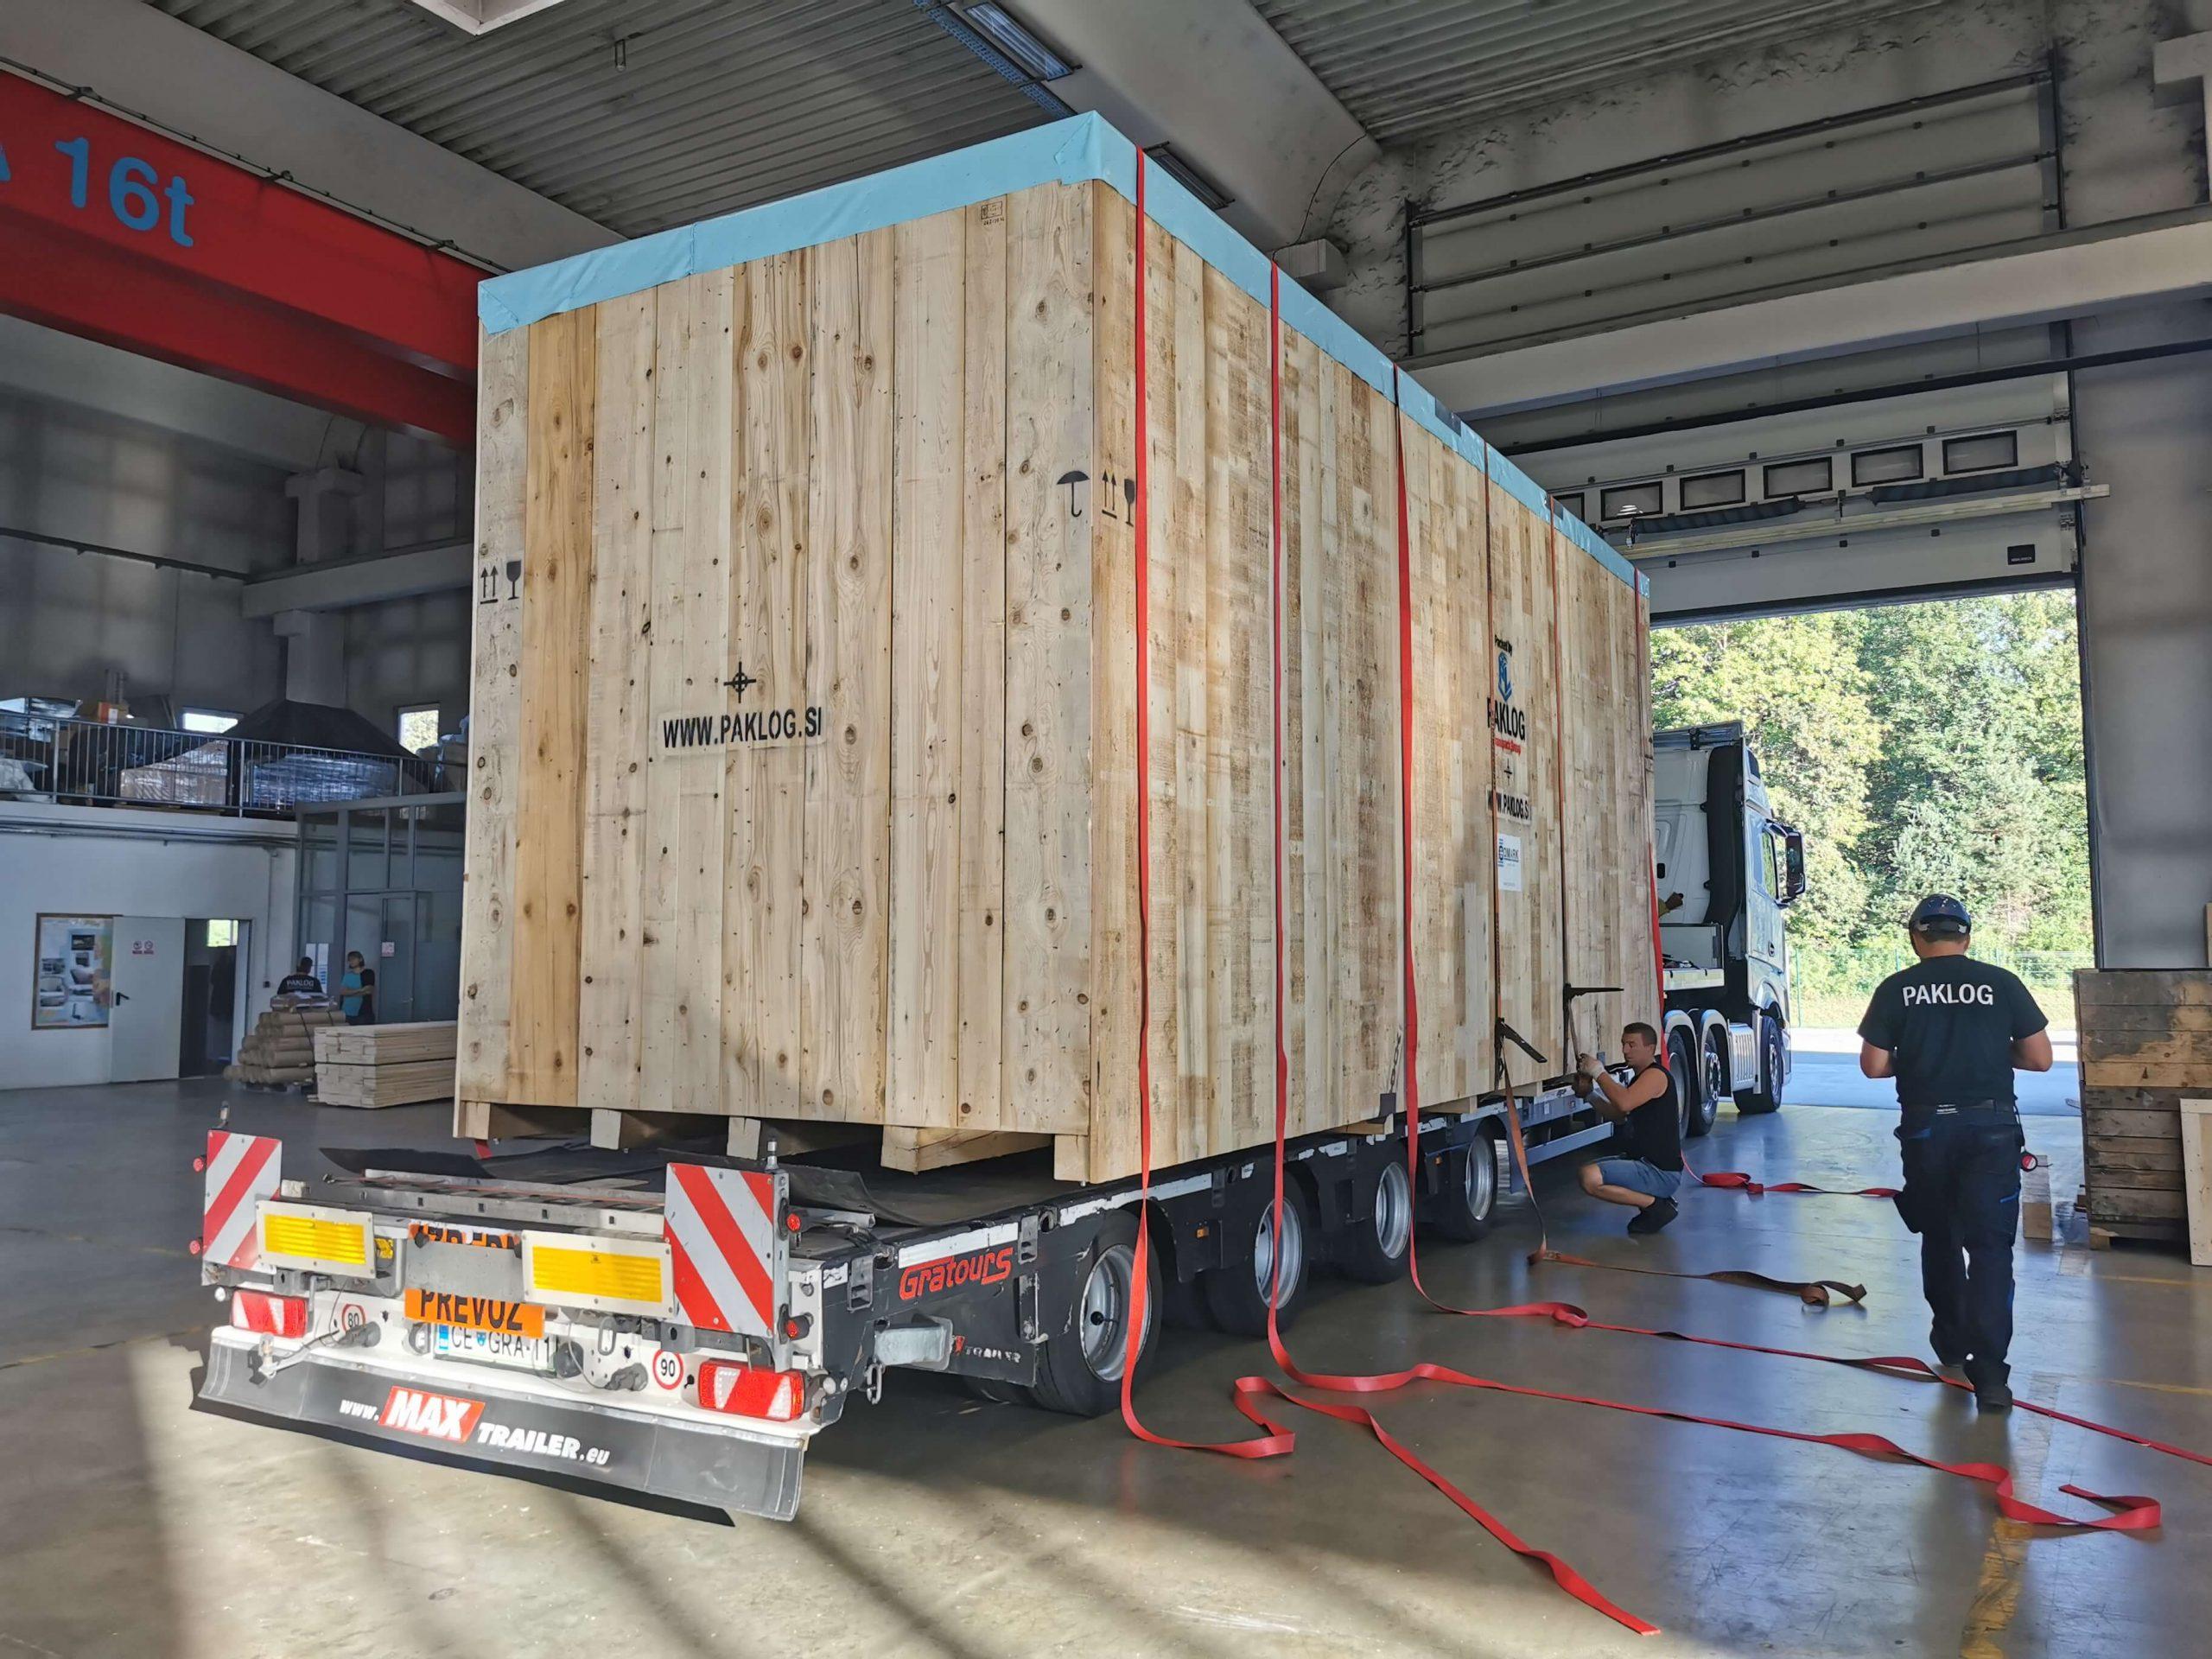 pakiranje tovora comark slovenija lesen zaboj scaled